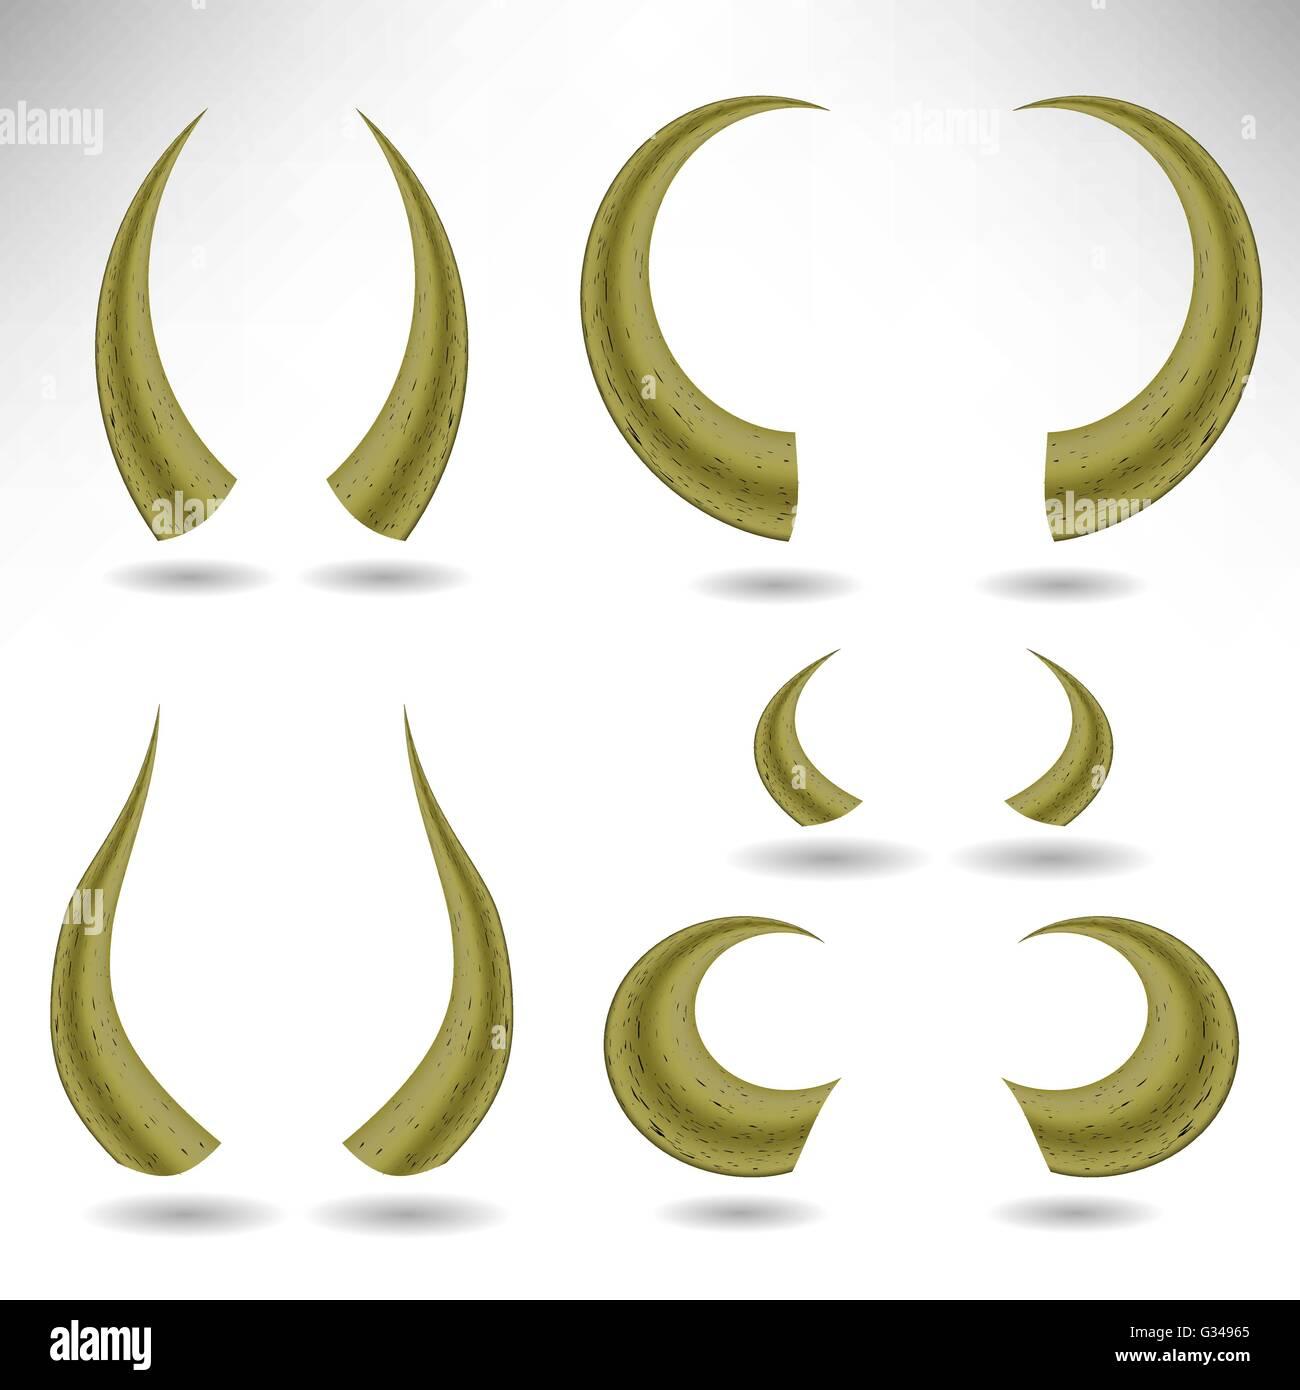 Animal Horns Isolated. Bull Horns Stock Photo, Royalty Free Image ...